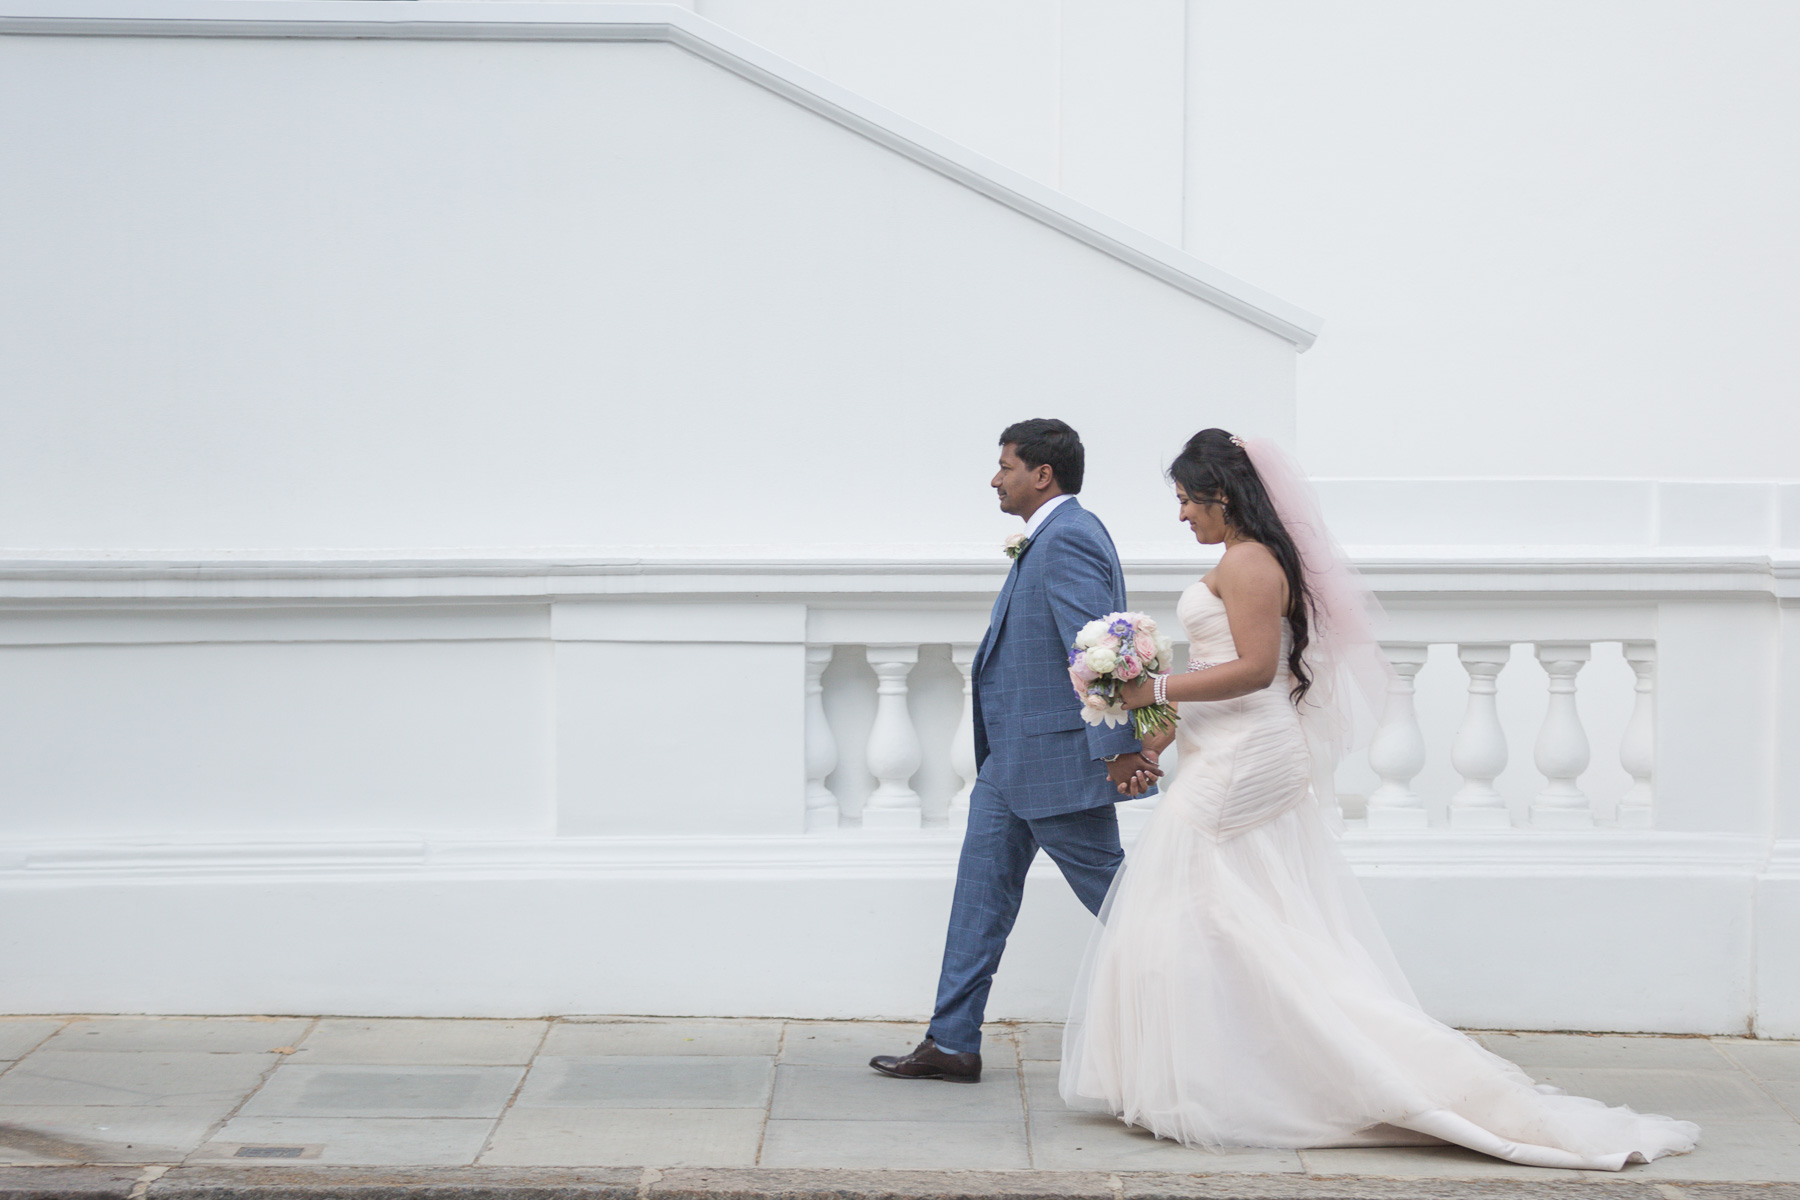 female-asian-wedding-photographer-london-0500-2.jpg